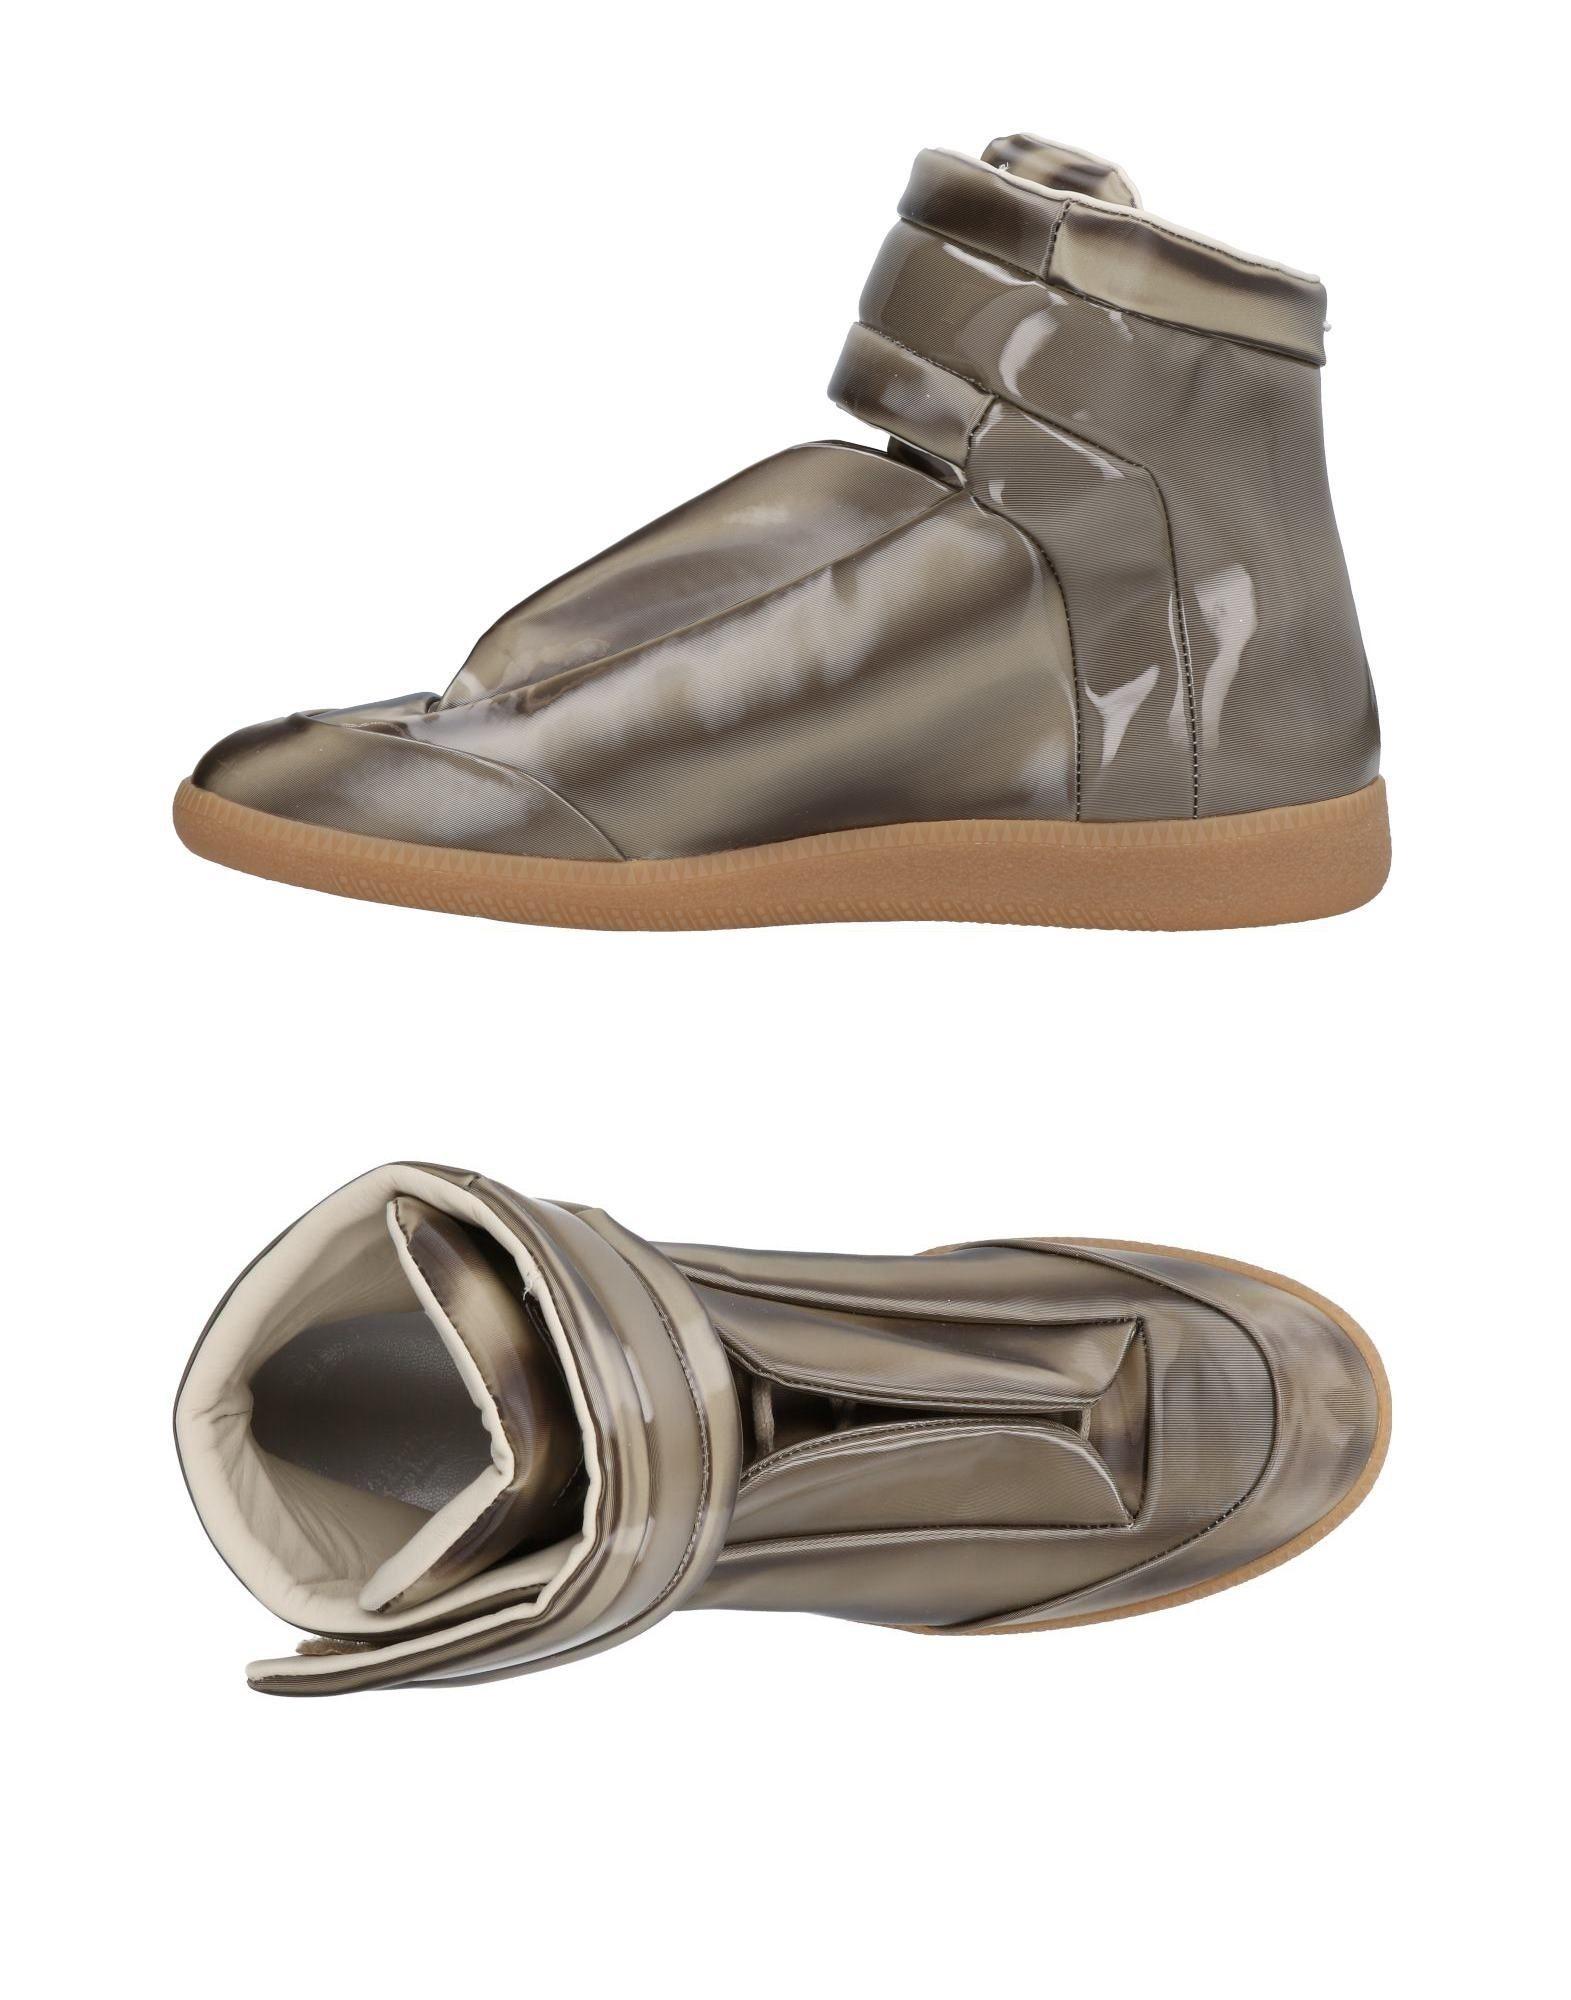 Maison Margiela Sneakers Herren  11472182NU Gute Qualität beliebte Schuhe